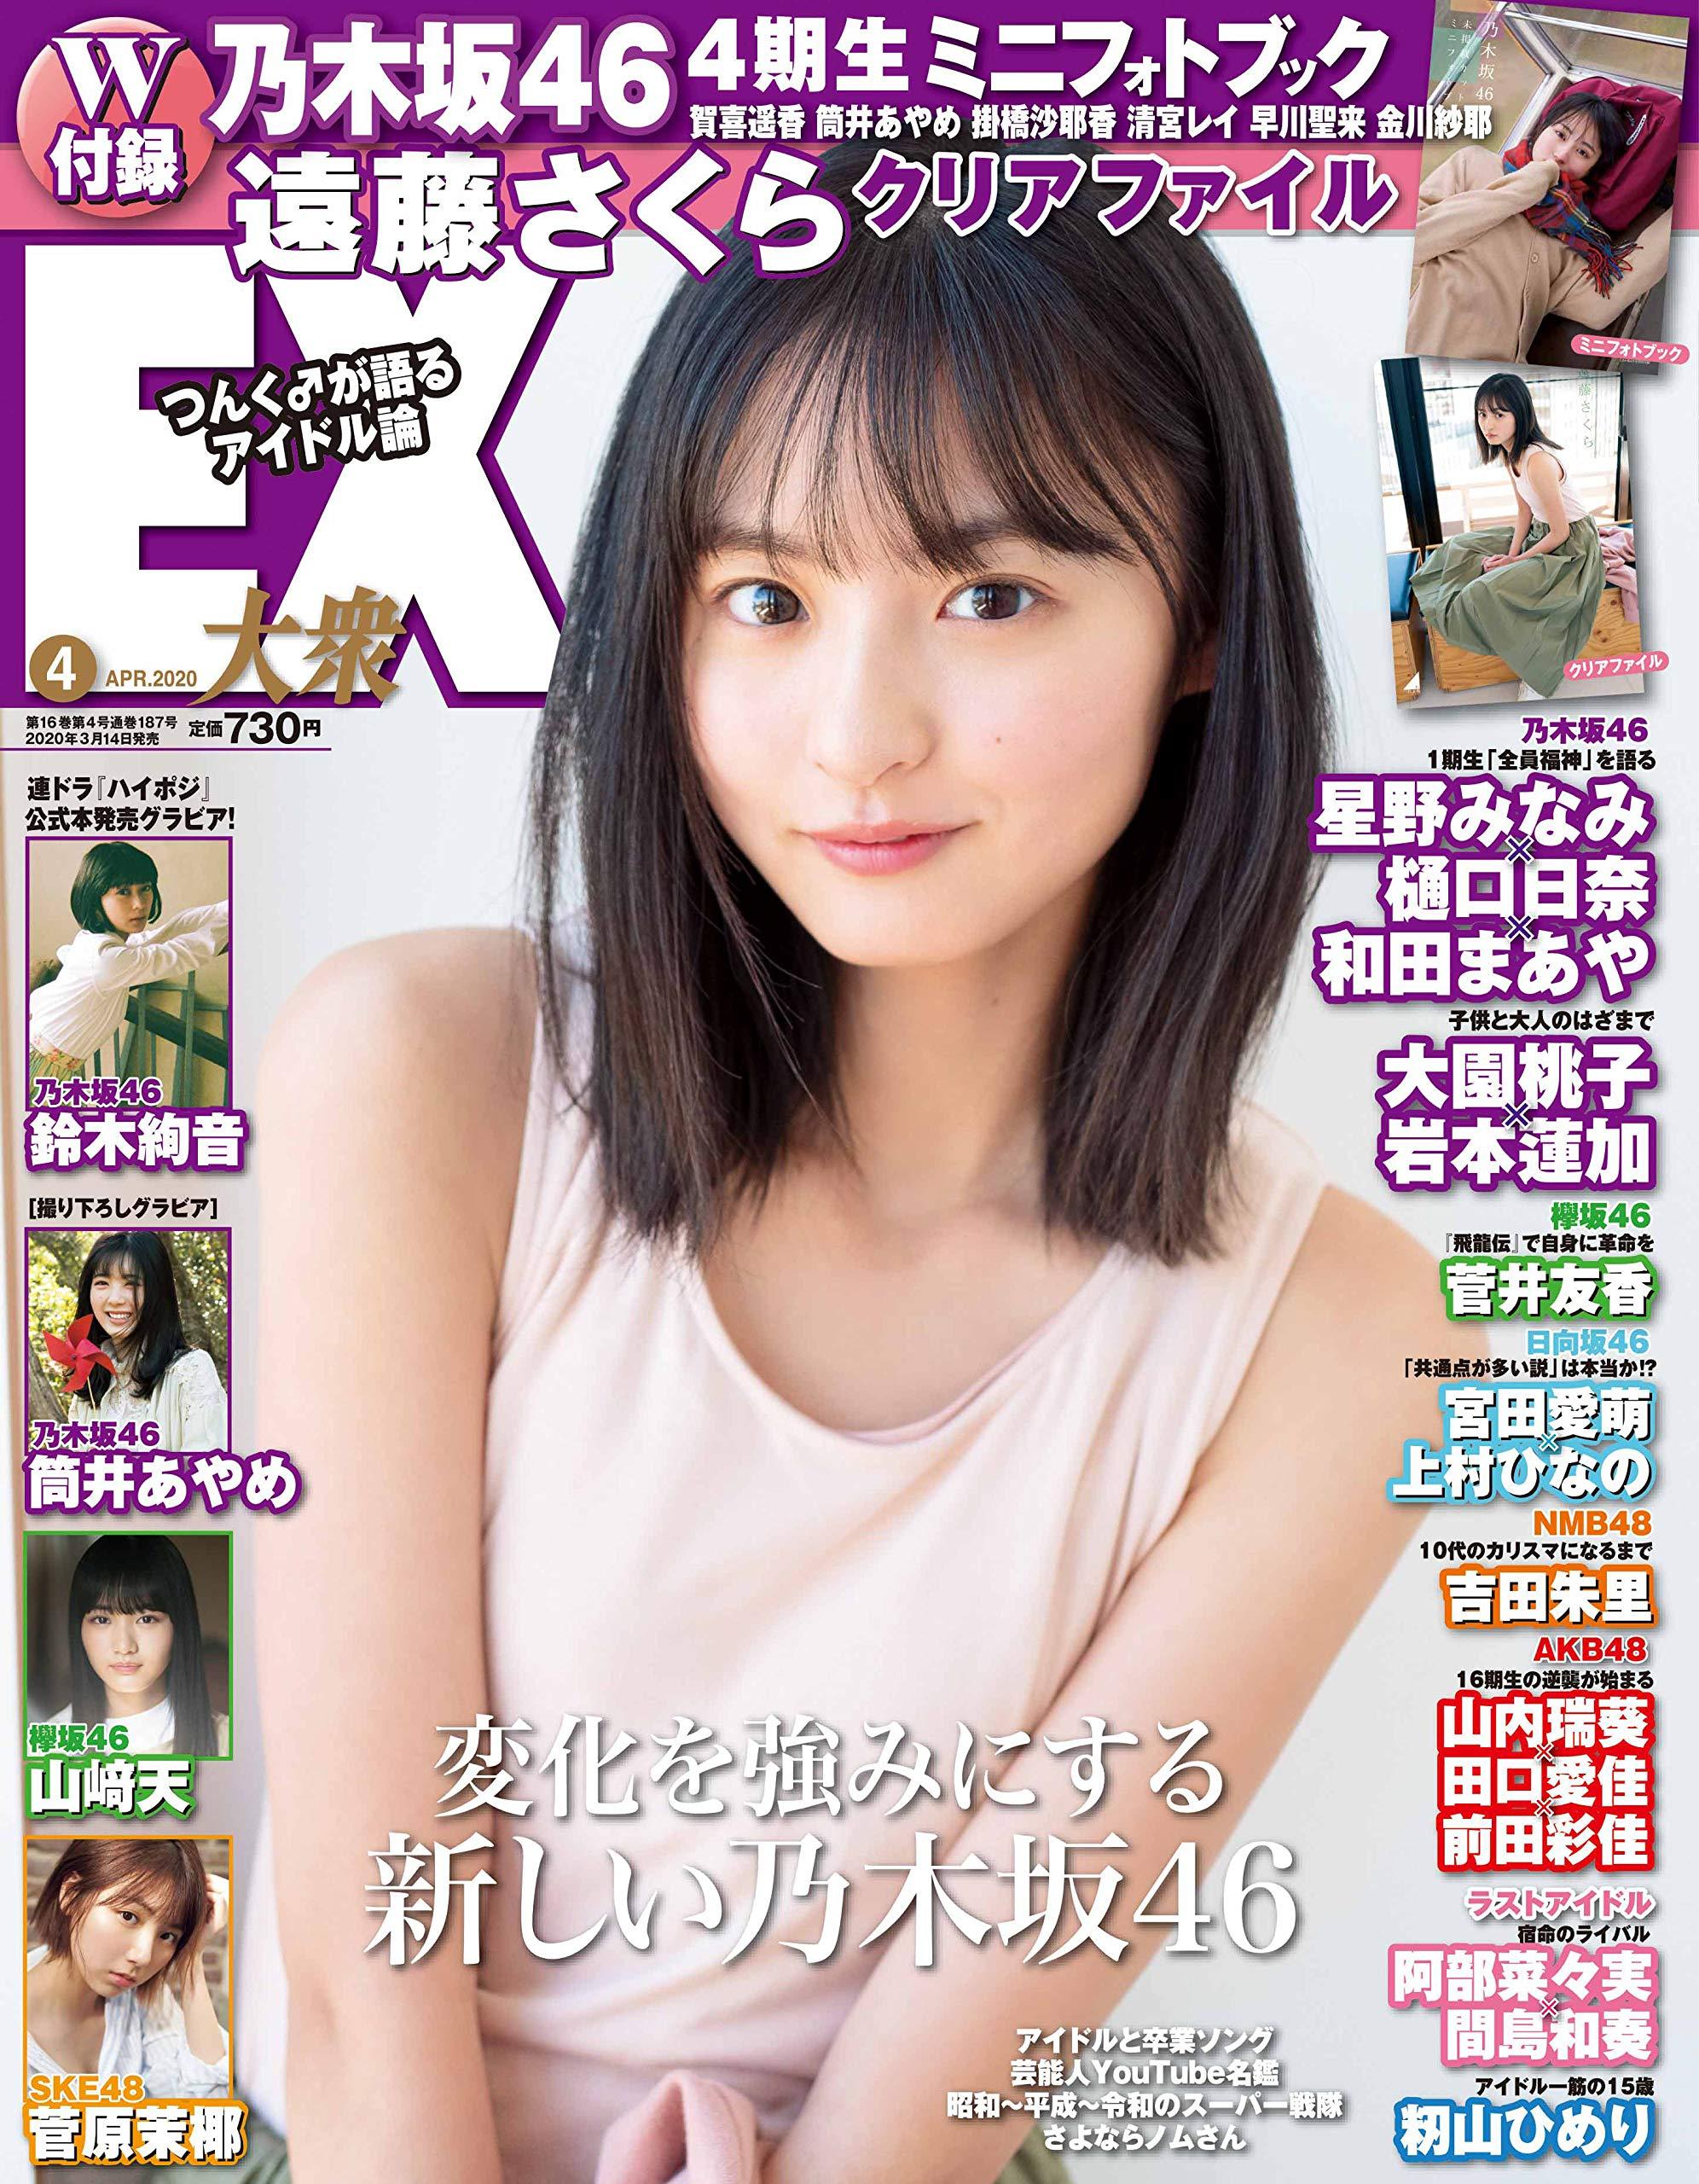 EX大衆 2020年04月号 乃木坂46 遠藤さくら